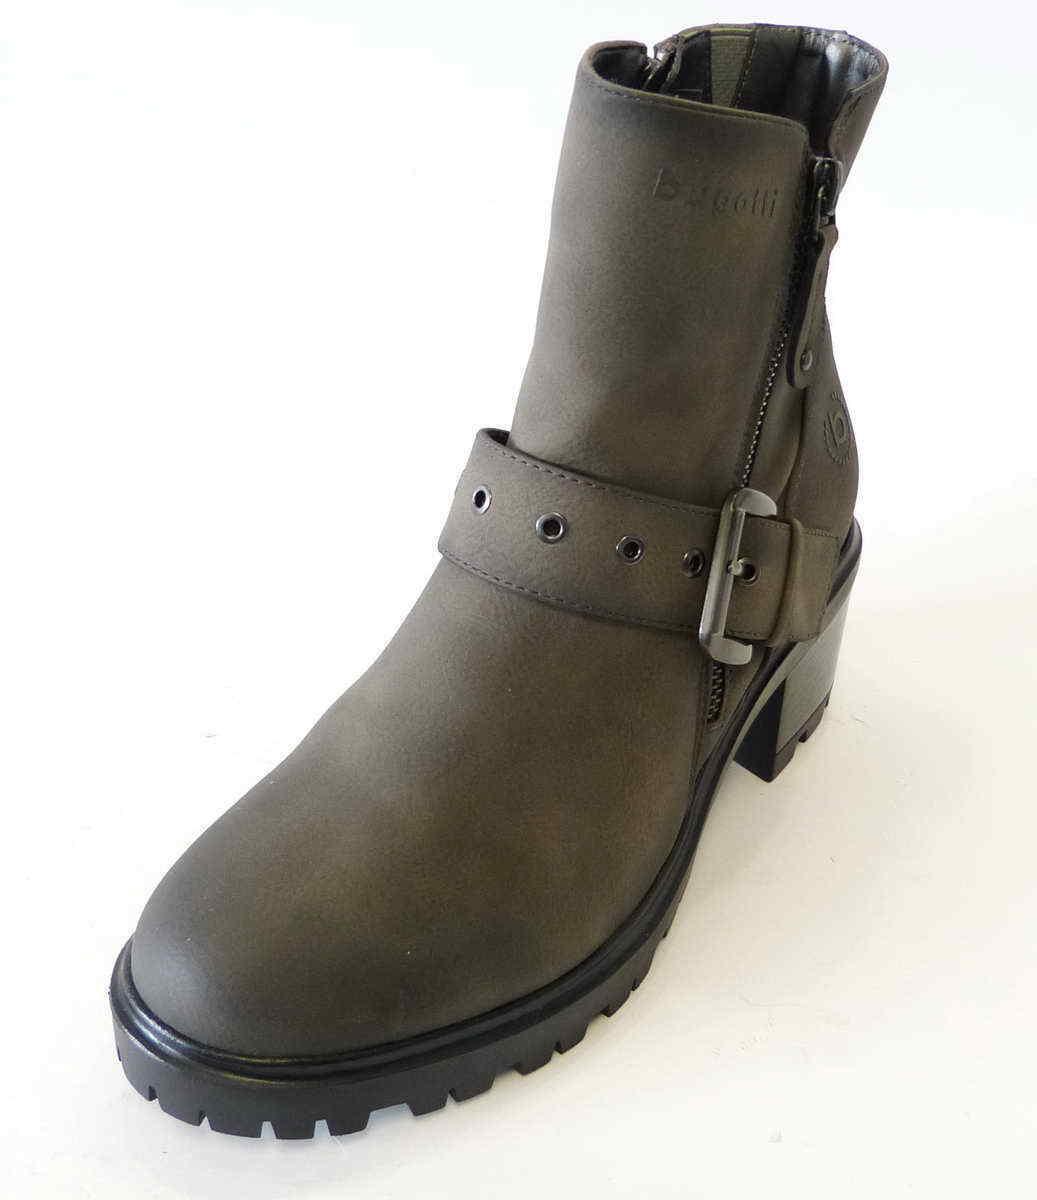 Bugatti Women Boot Clea Grey grau Stiefel Reißverschluß 431576305900 1100